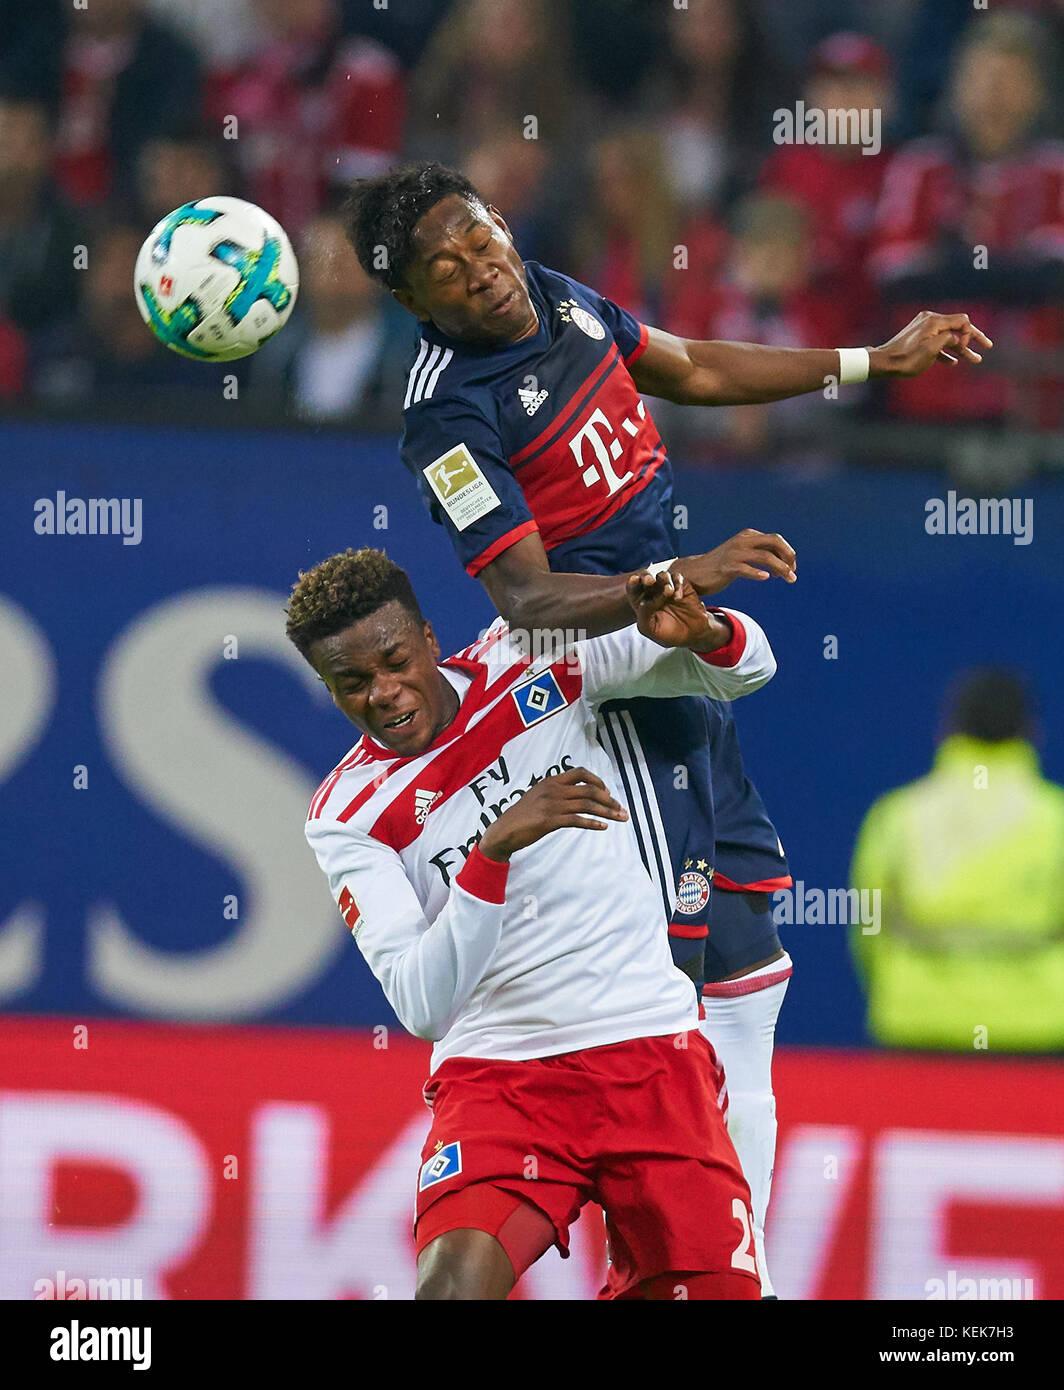 Hamburg, Germany. 21st October, 2017. 1. Div German Soccer League, Hamburg, October 21, 2017 David ALABA, FCB 27 - Stock Image